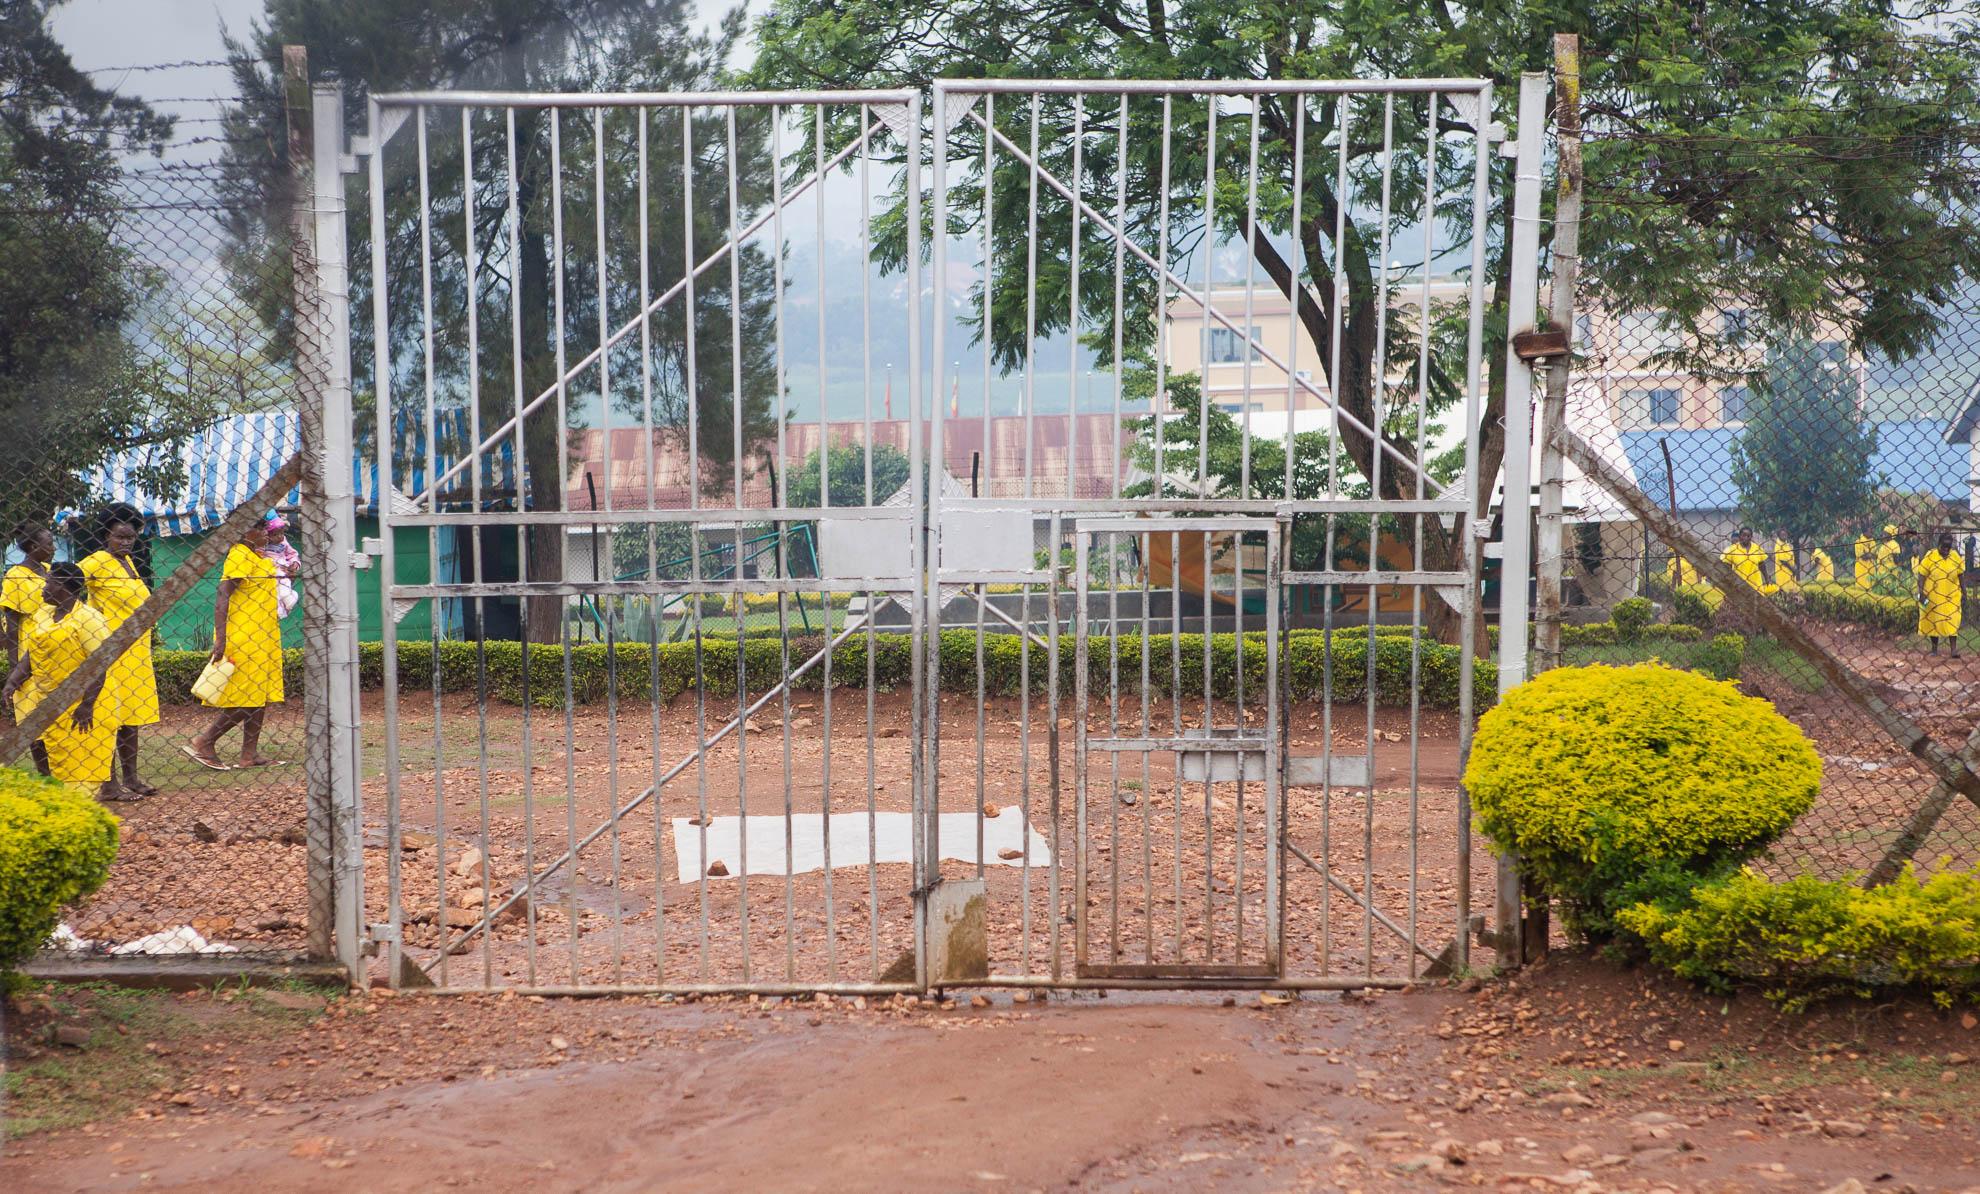 death penalty, photography, photos, execution, prison, documentary, death row, uganda, africa, women